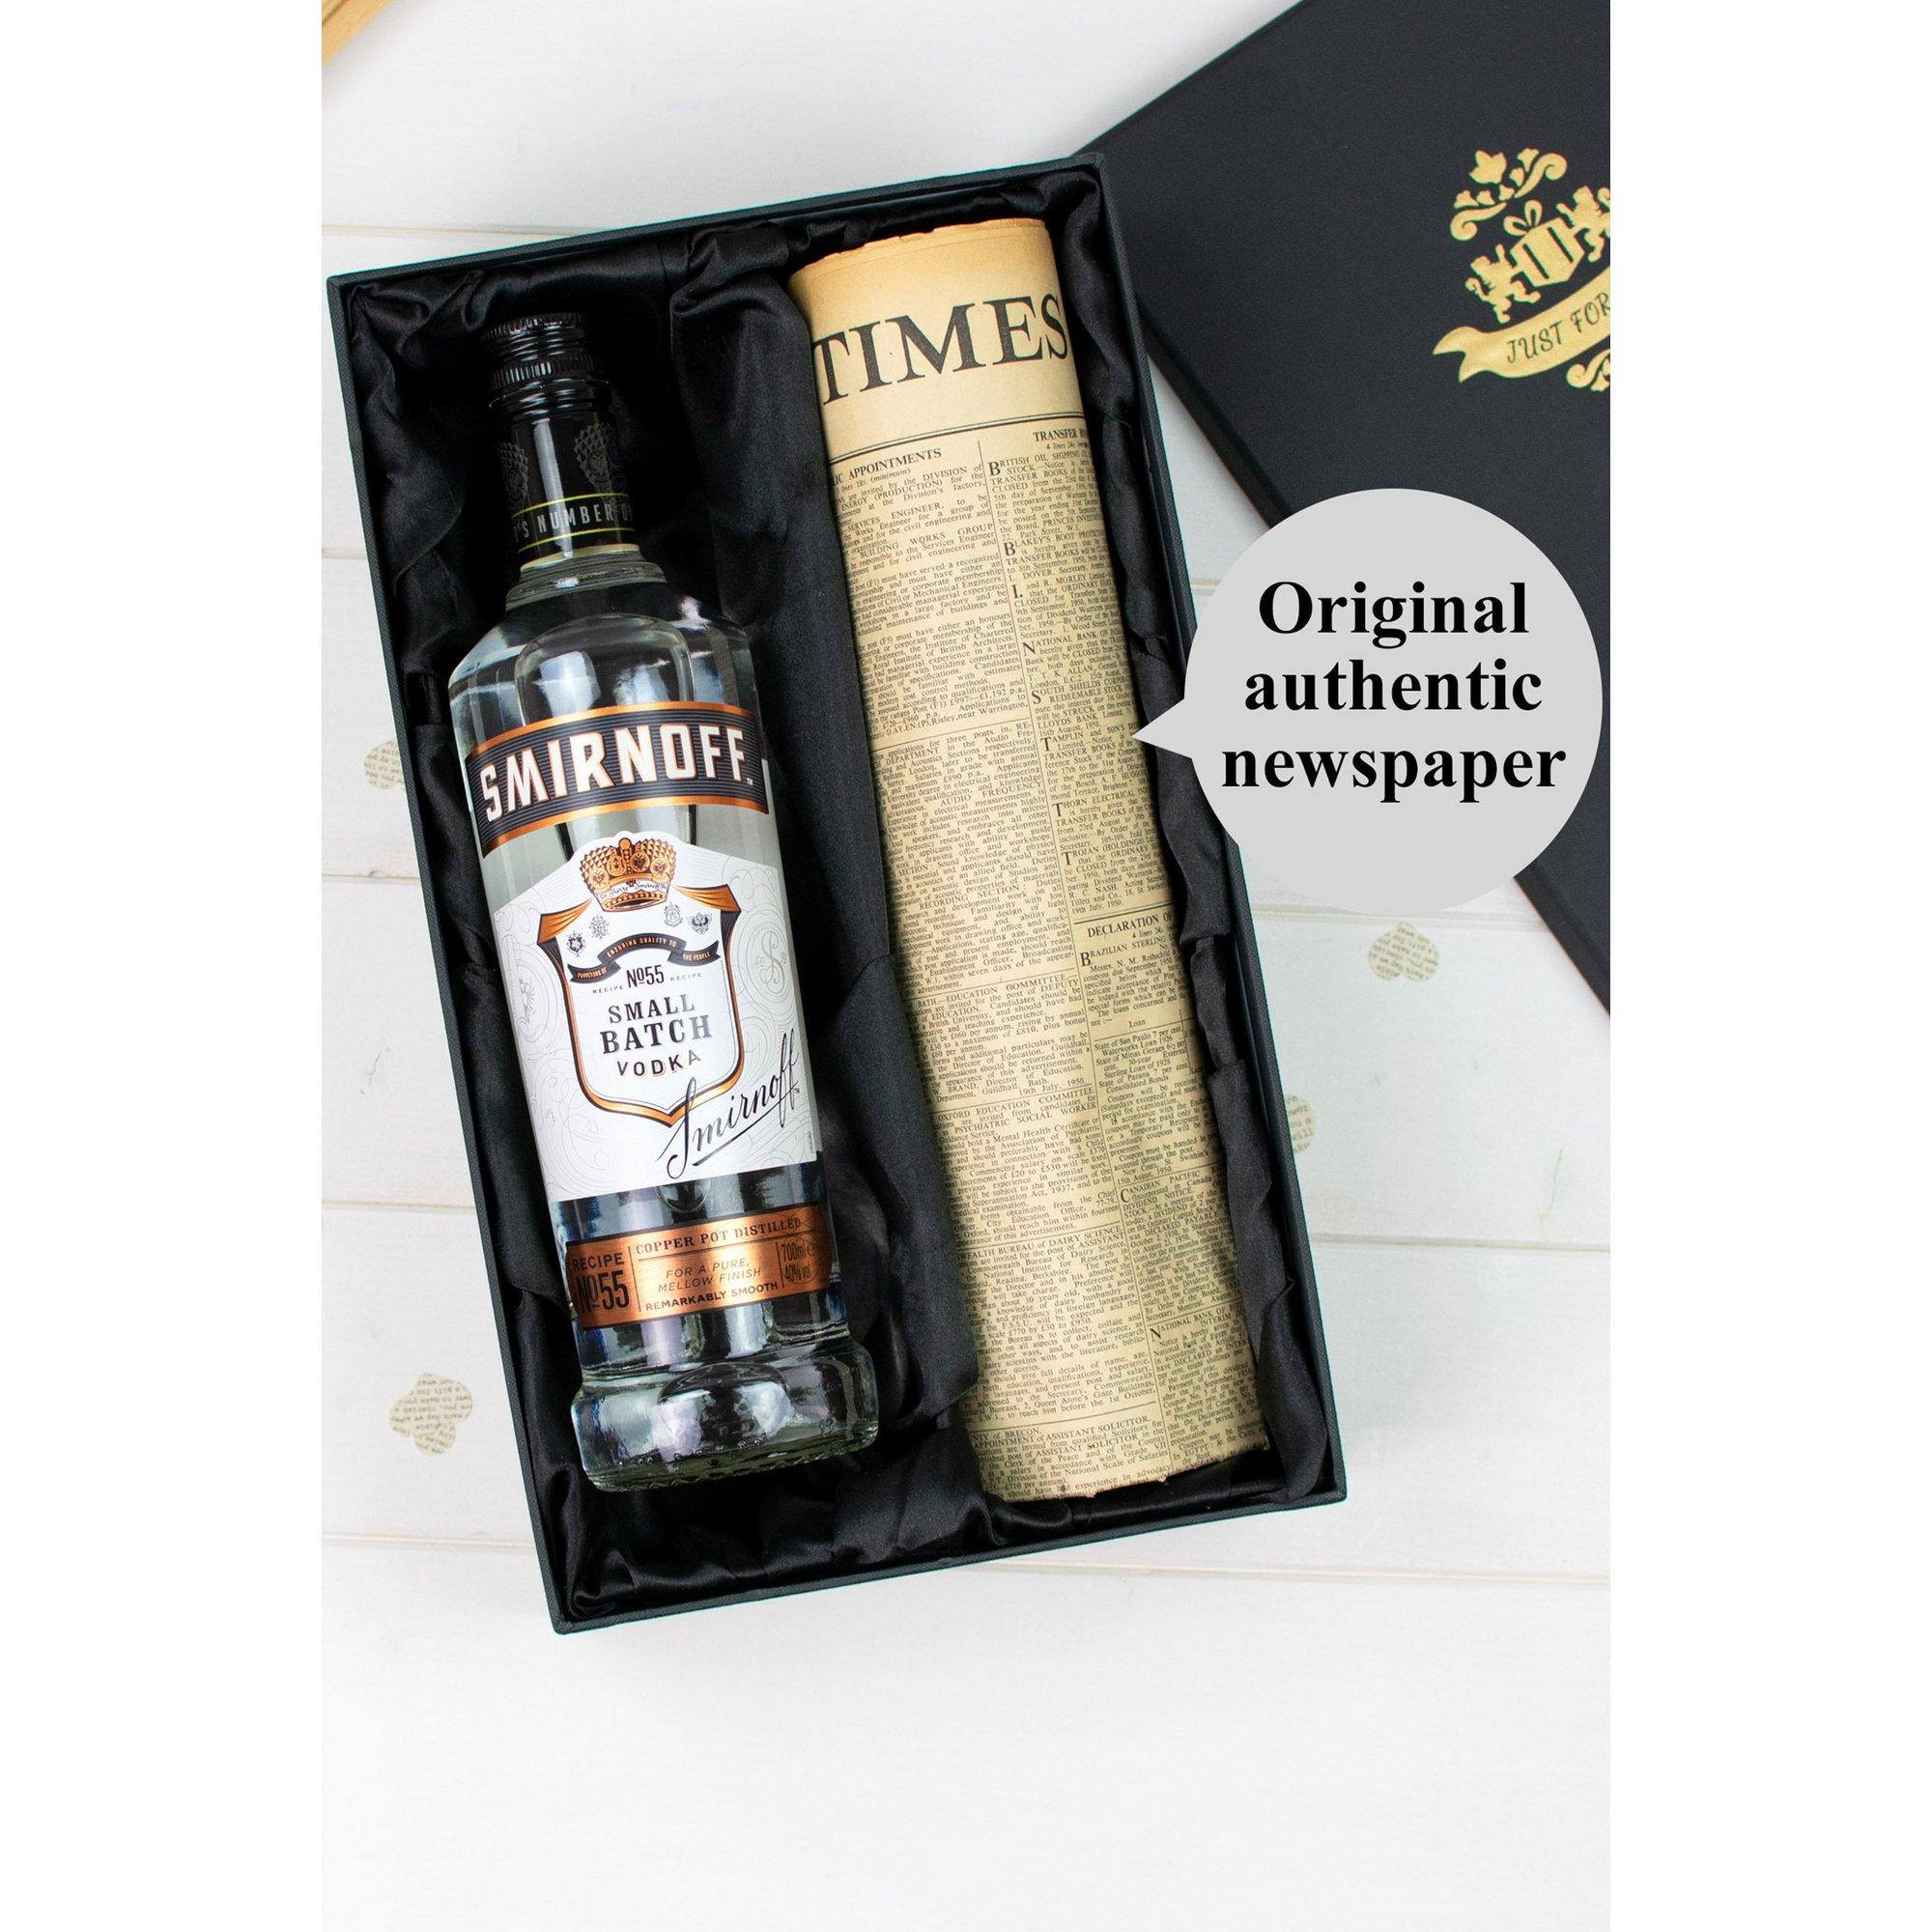 Image of Black Smirnoff Vodka and Personalised Original Newspaper